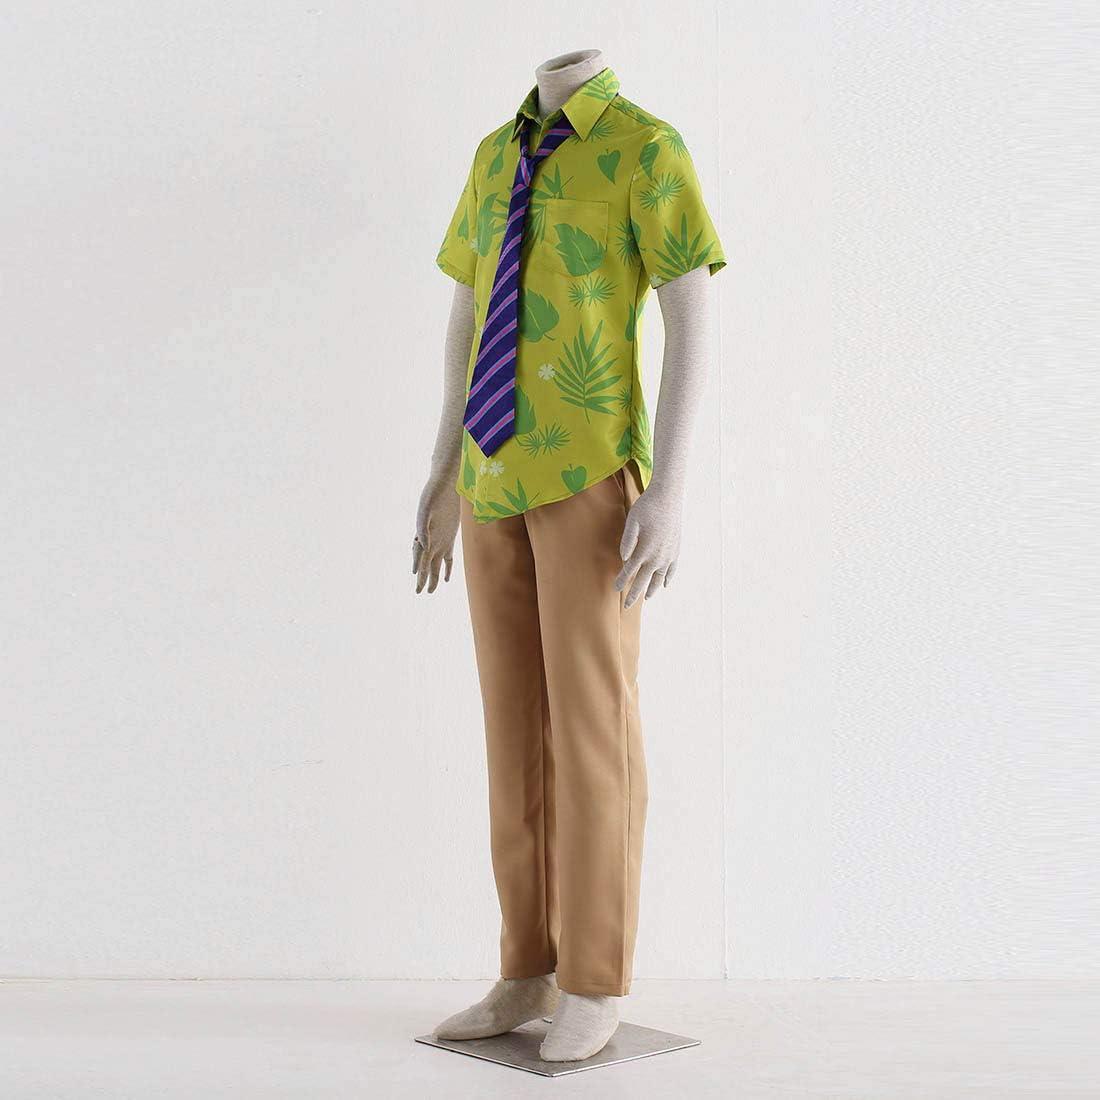 Toraway Summer Mens Shirt Fashion Shirt Beach Shirt Mens Casual Shirt Blouse Beach Quick Dry Shirt Top Blouse